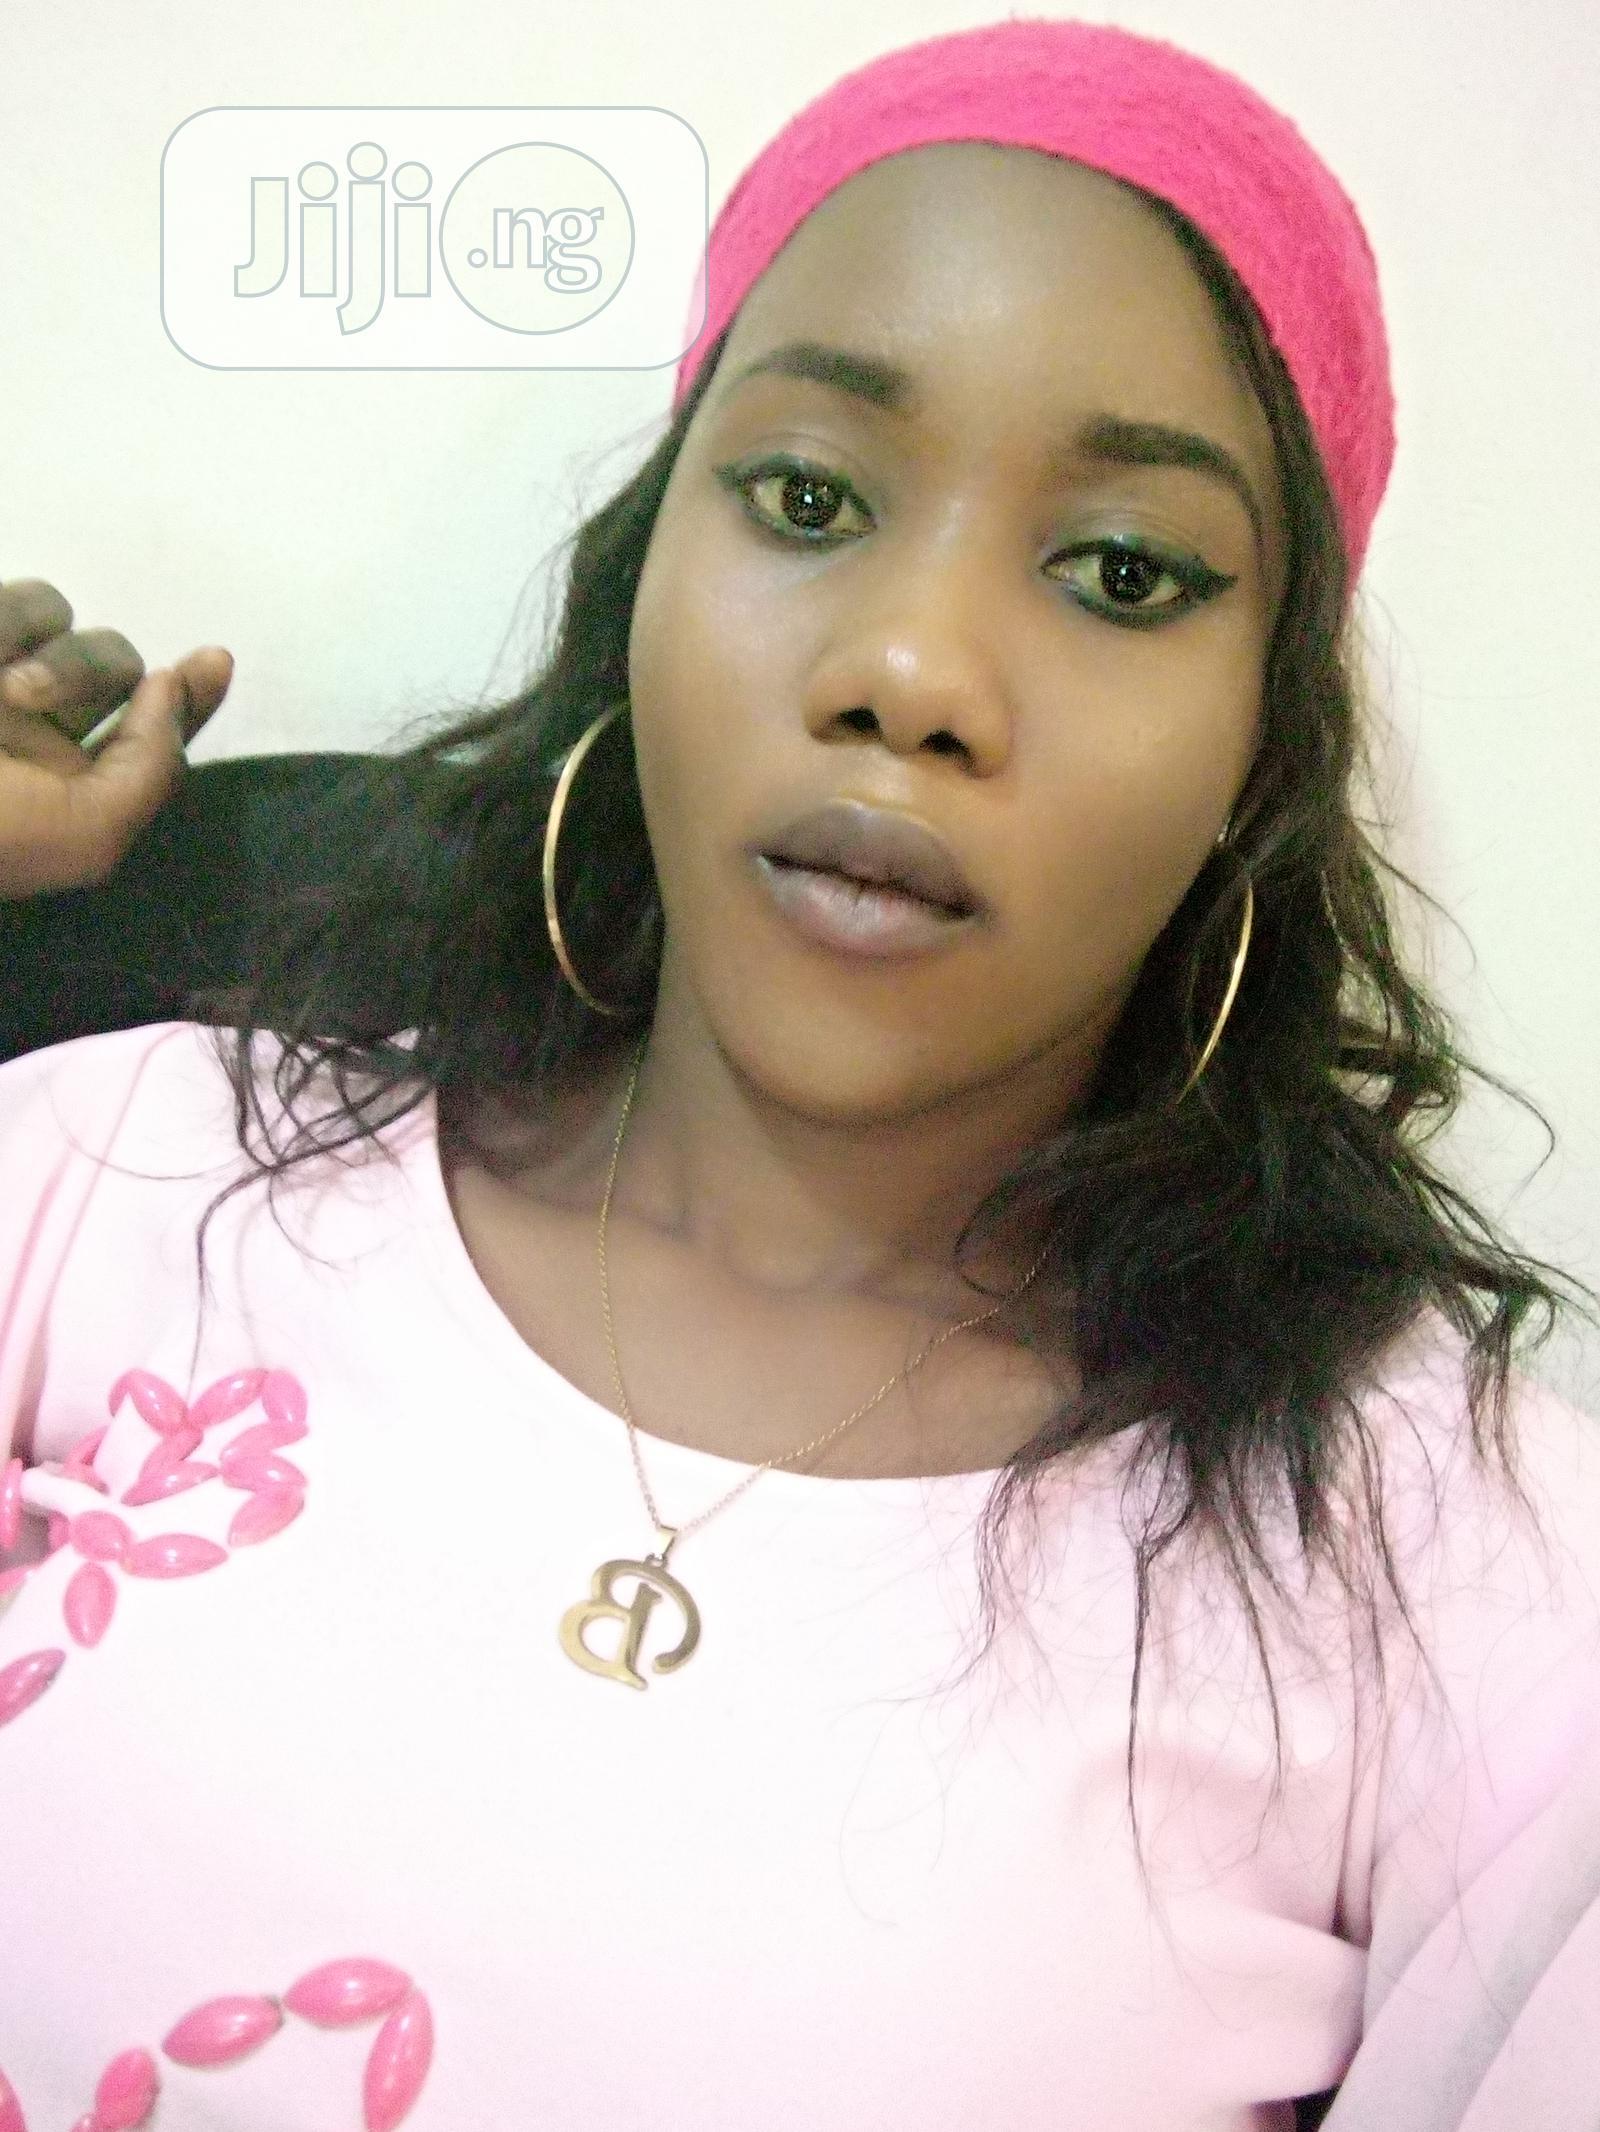 Ushering and modelling